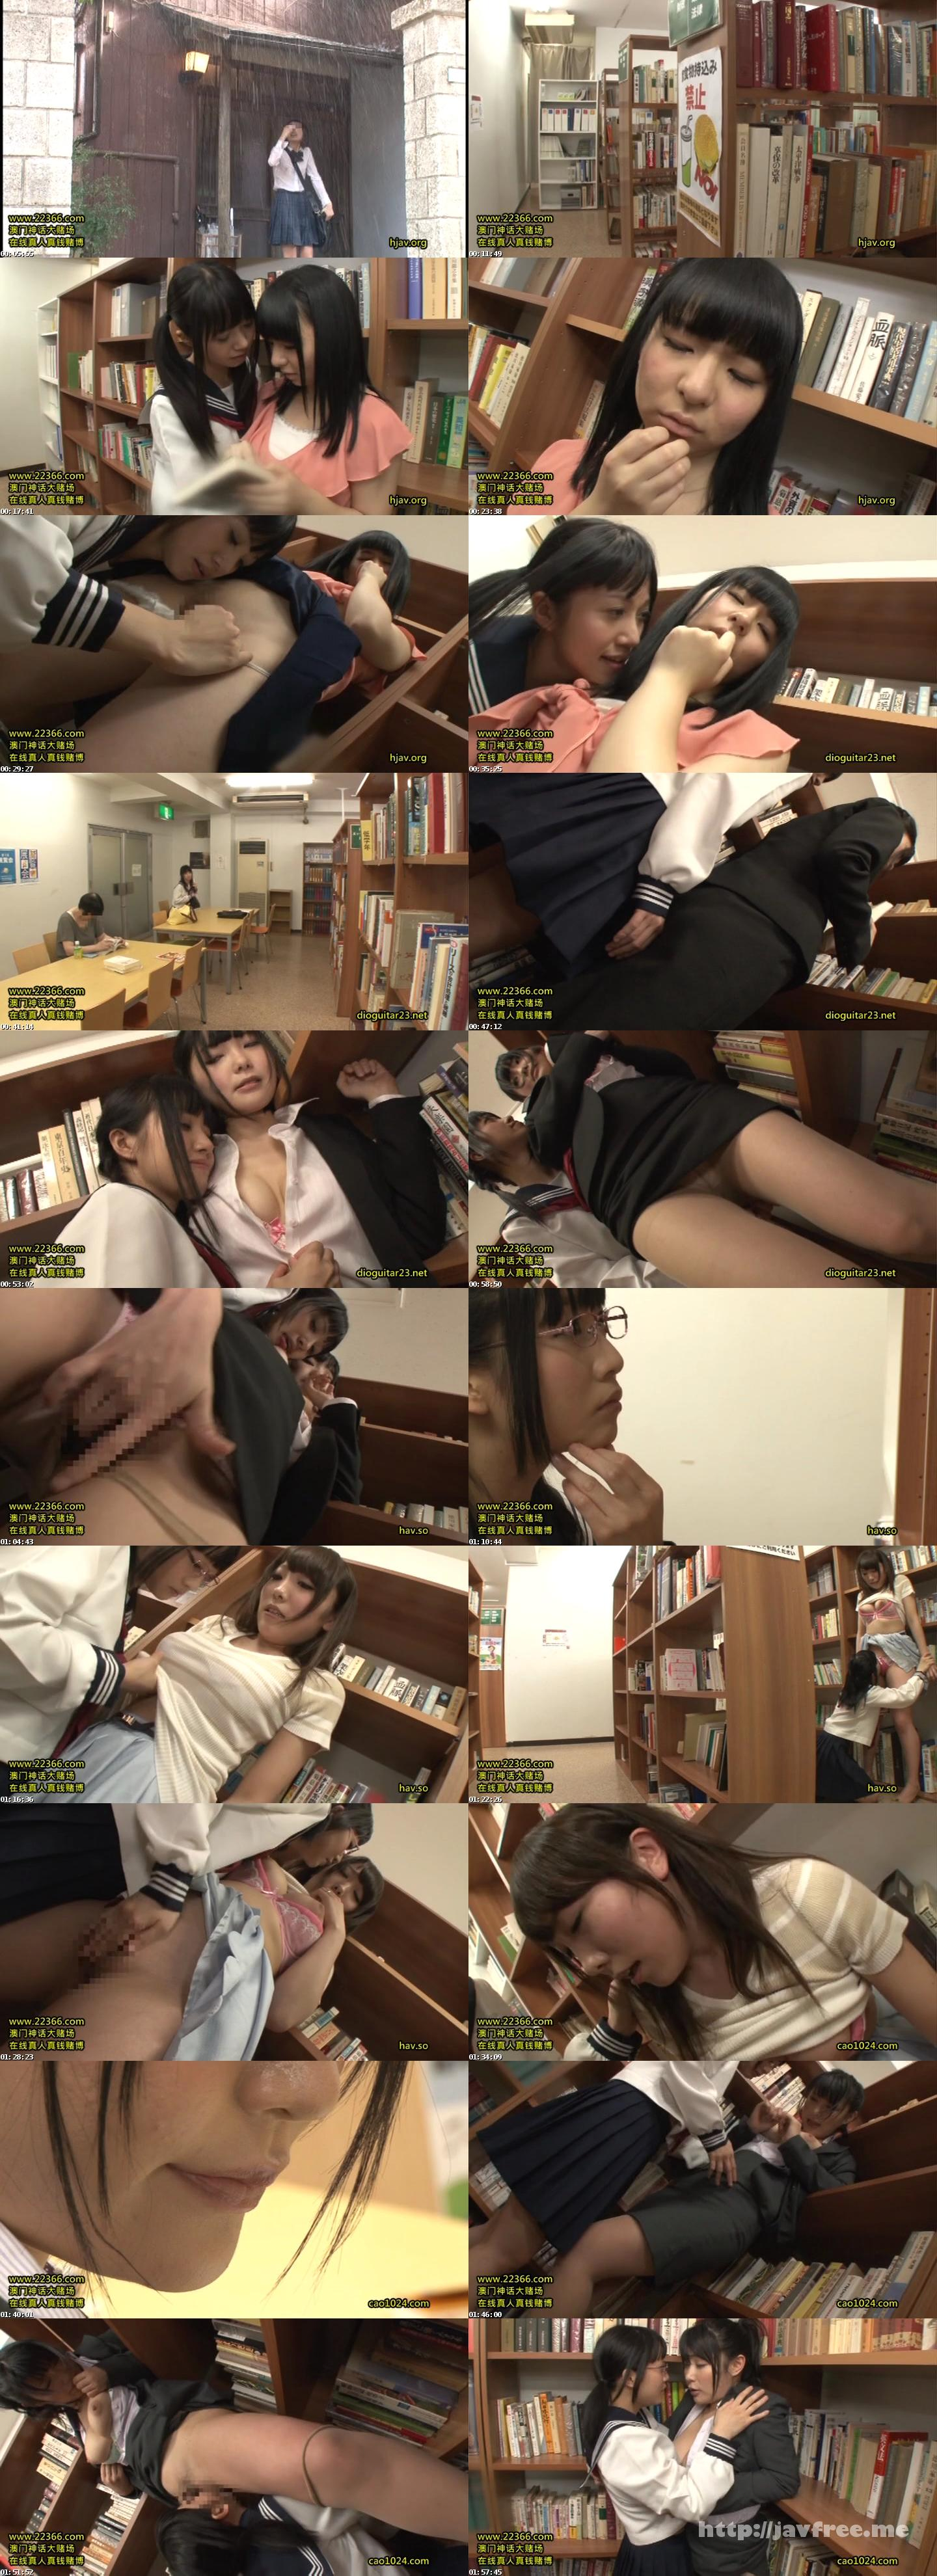 [AP-158] 女子校生図書館レズ痴漢 真面目そうな見た目と裏腹に、異常に性欲が強い美少女女子校生は図書館で見かけたウブそうな美人お姉さんをレズ痴漢してしまう! - image AP-158 on https://javfree.me